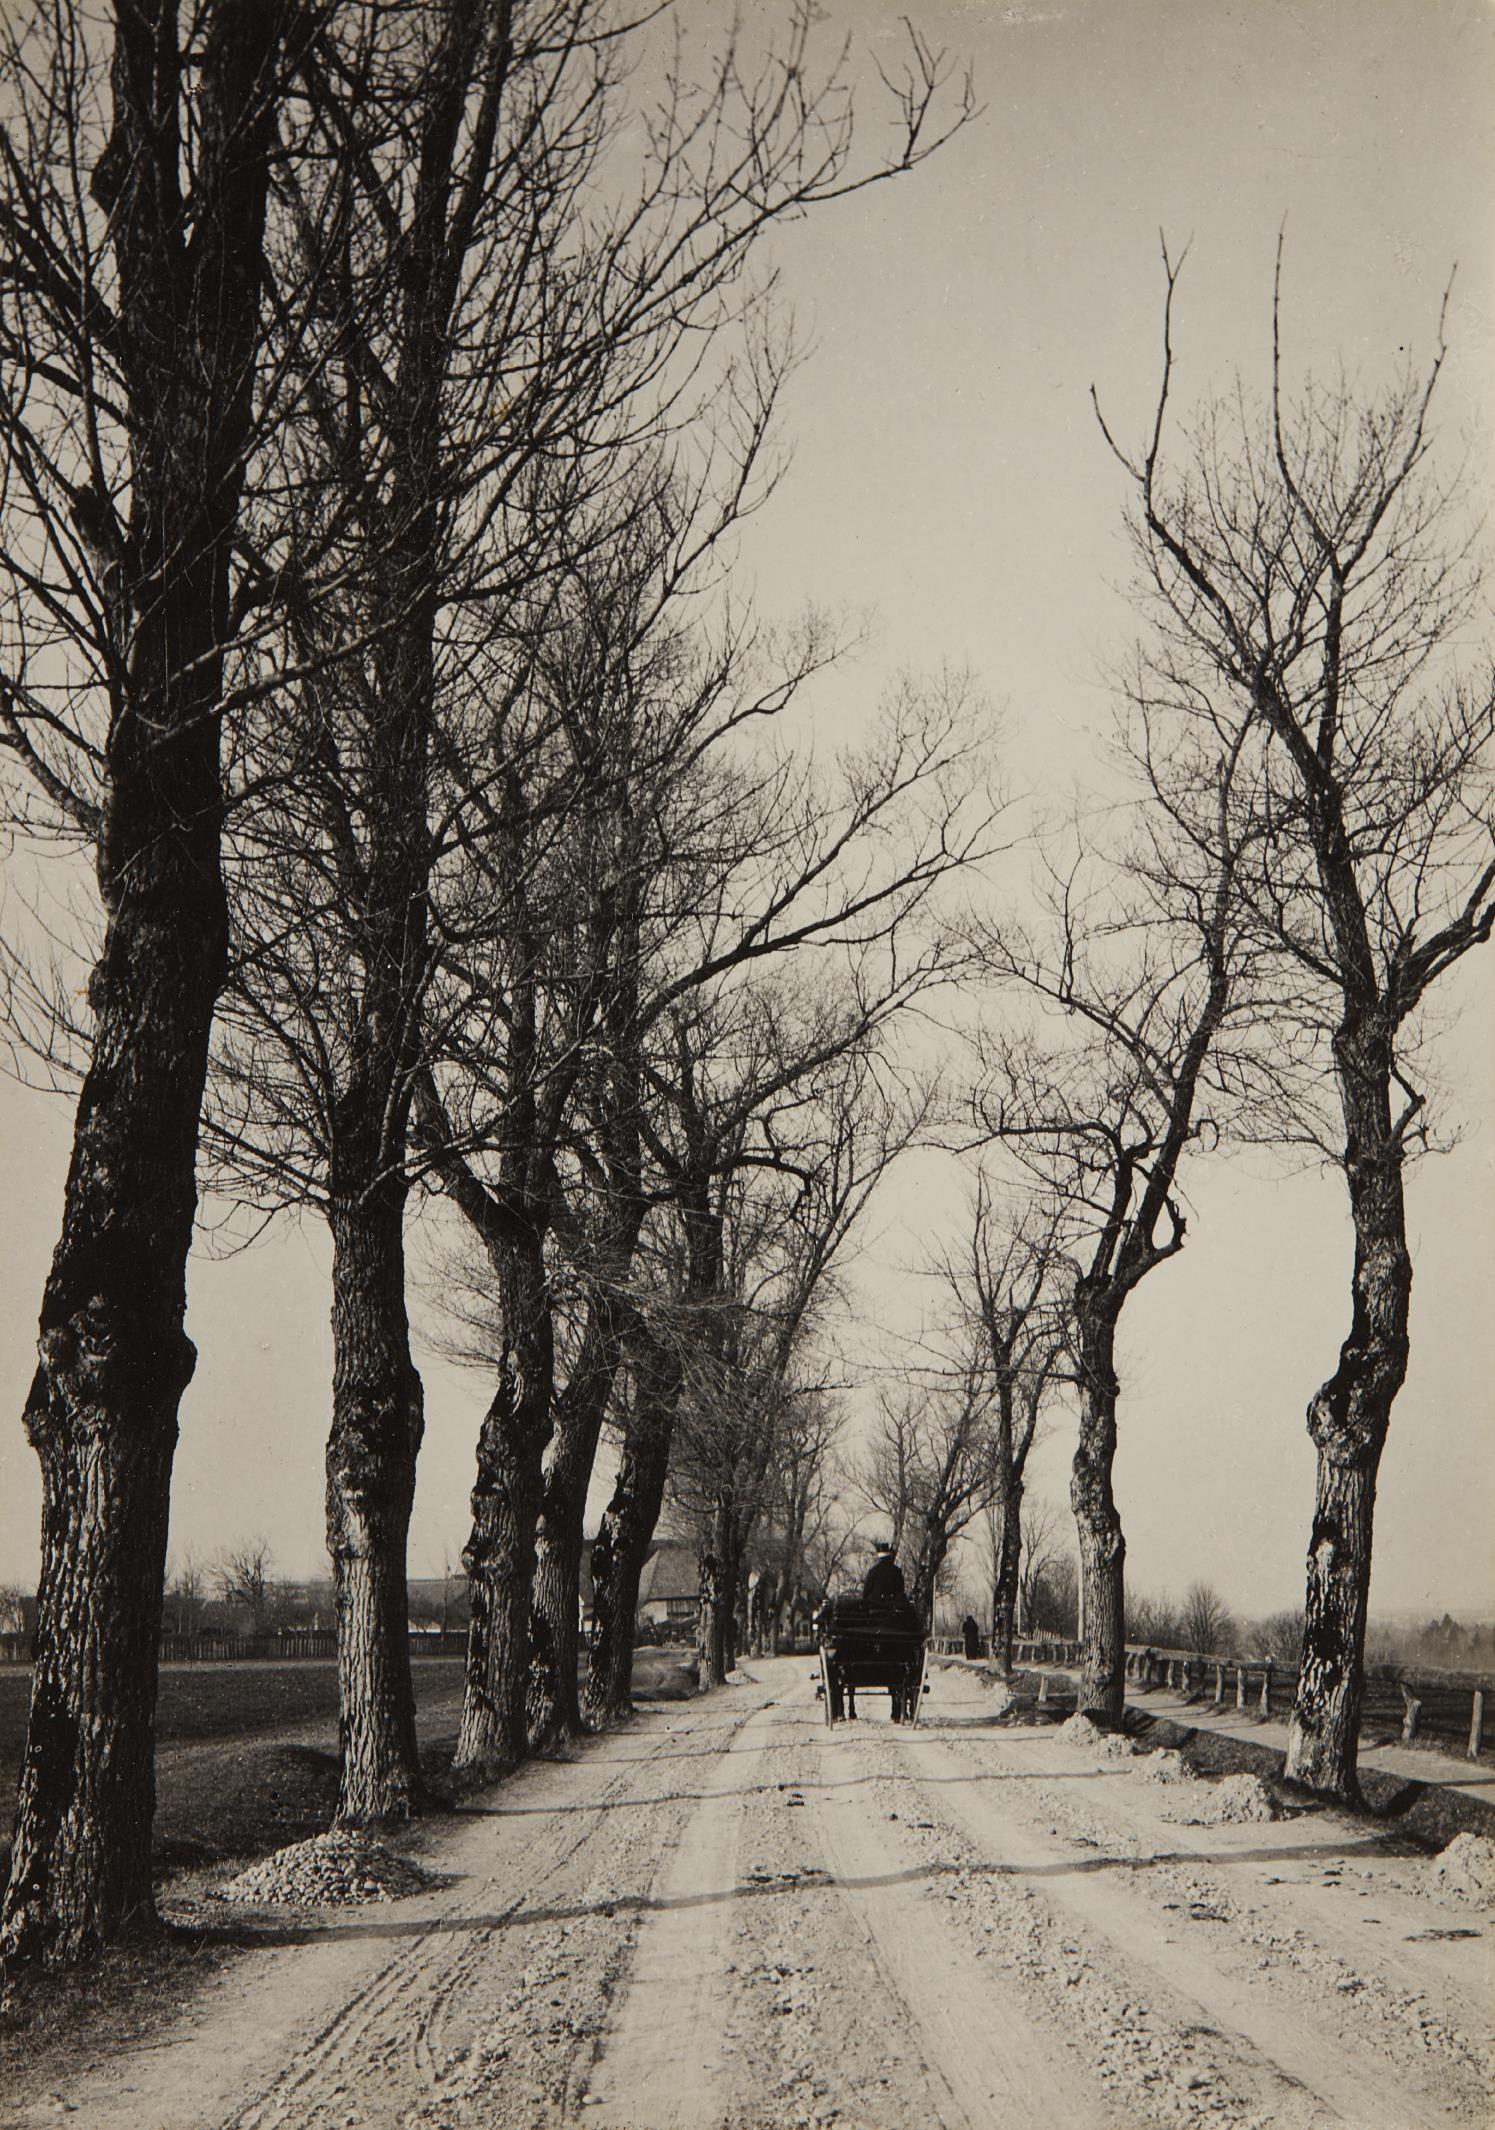 Alfred Stieglitz-November Days-1887